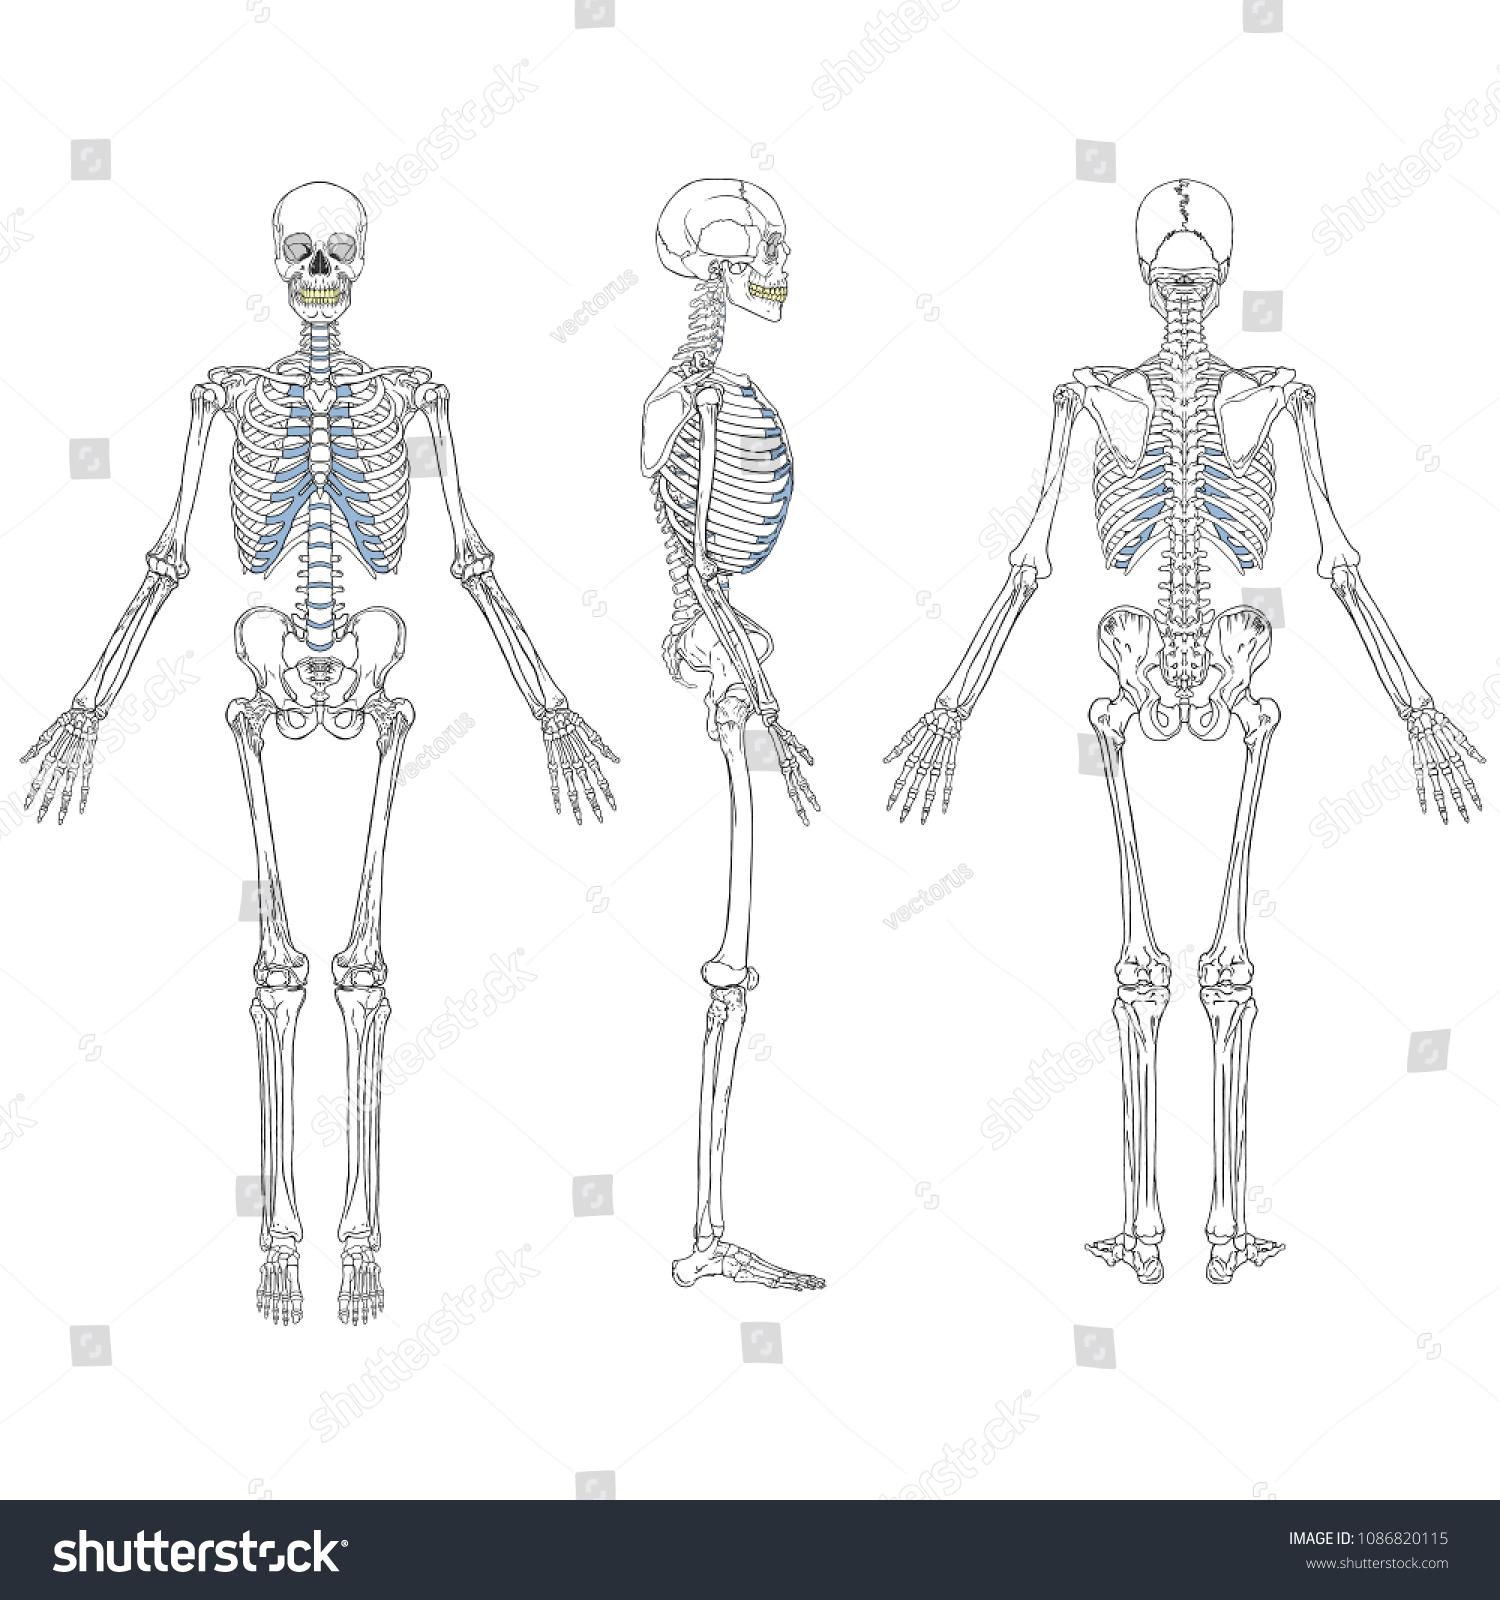 hight resolution of vector illustration of human skeleton vector drawing